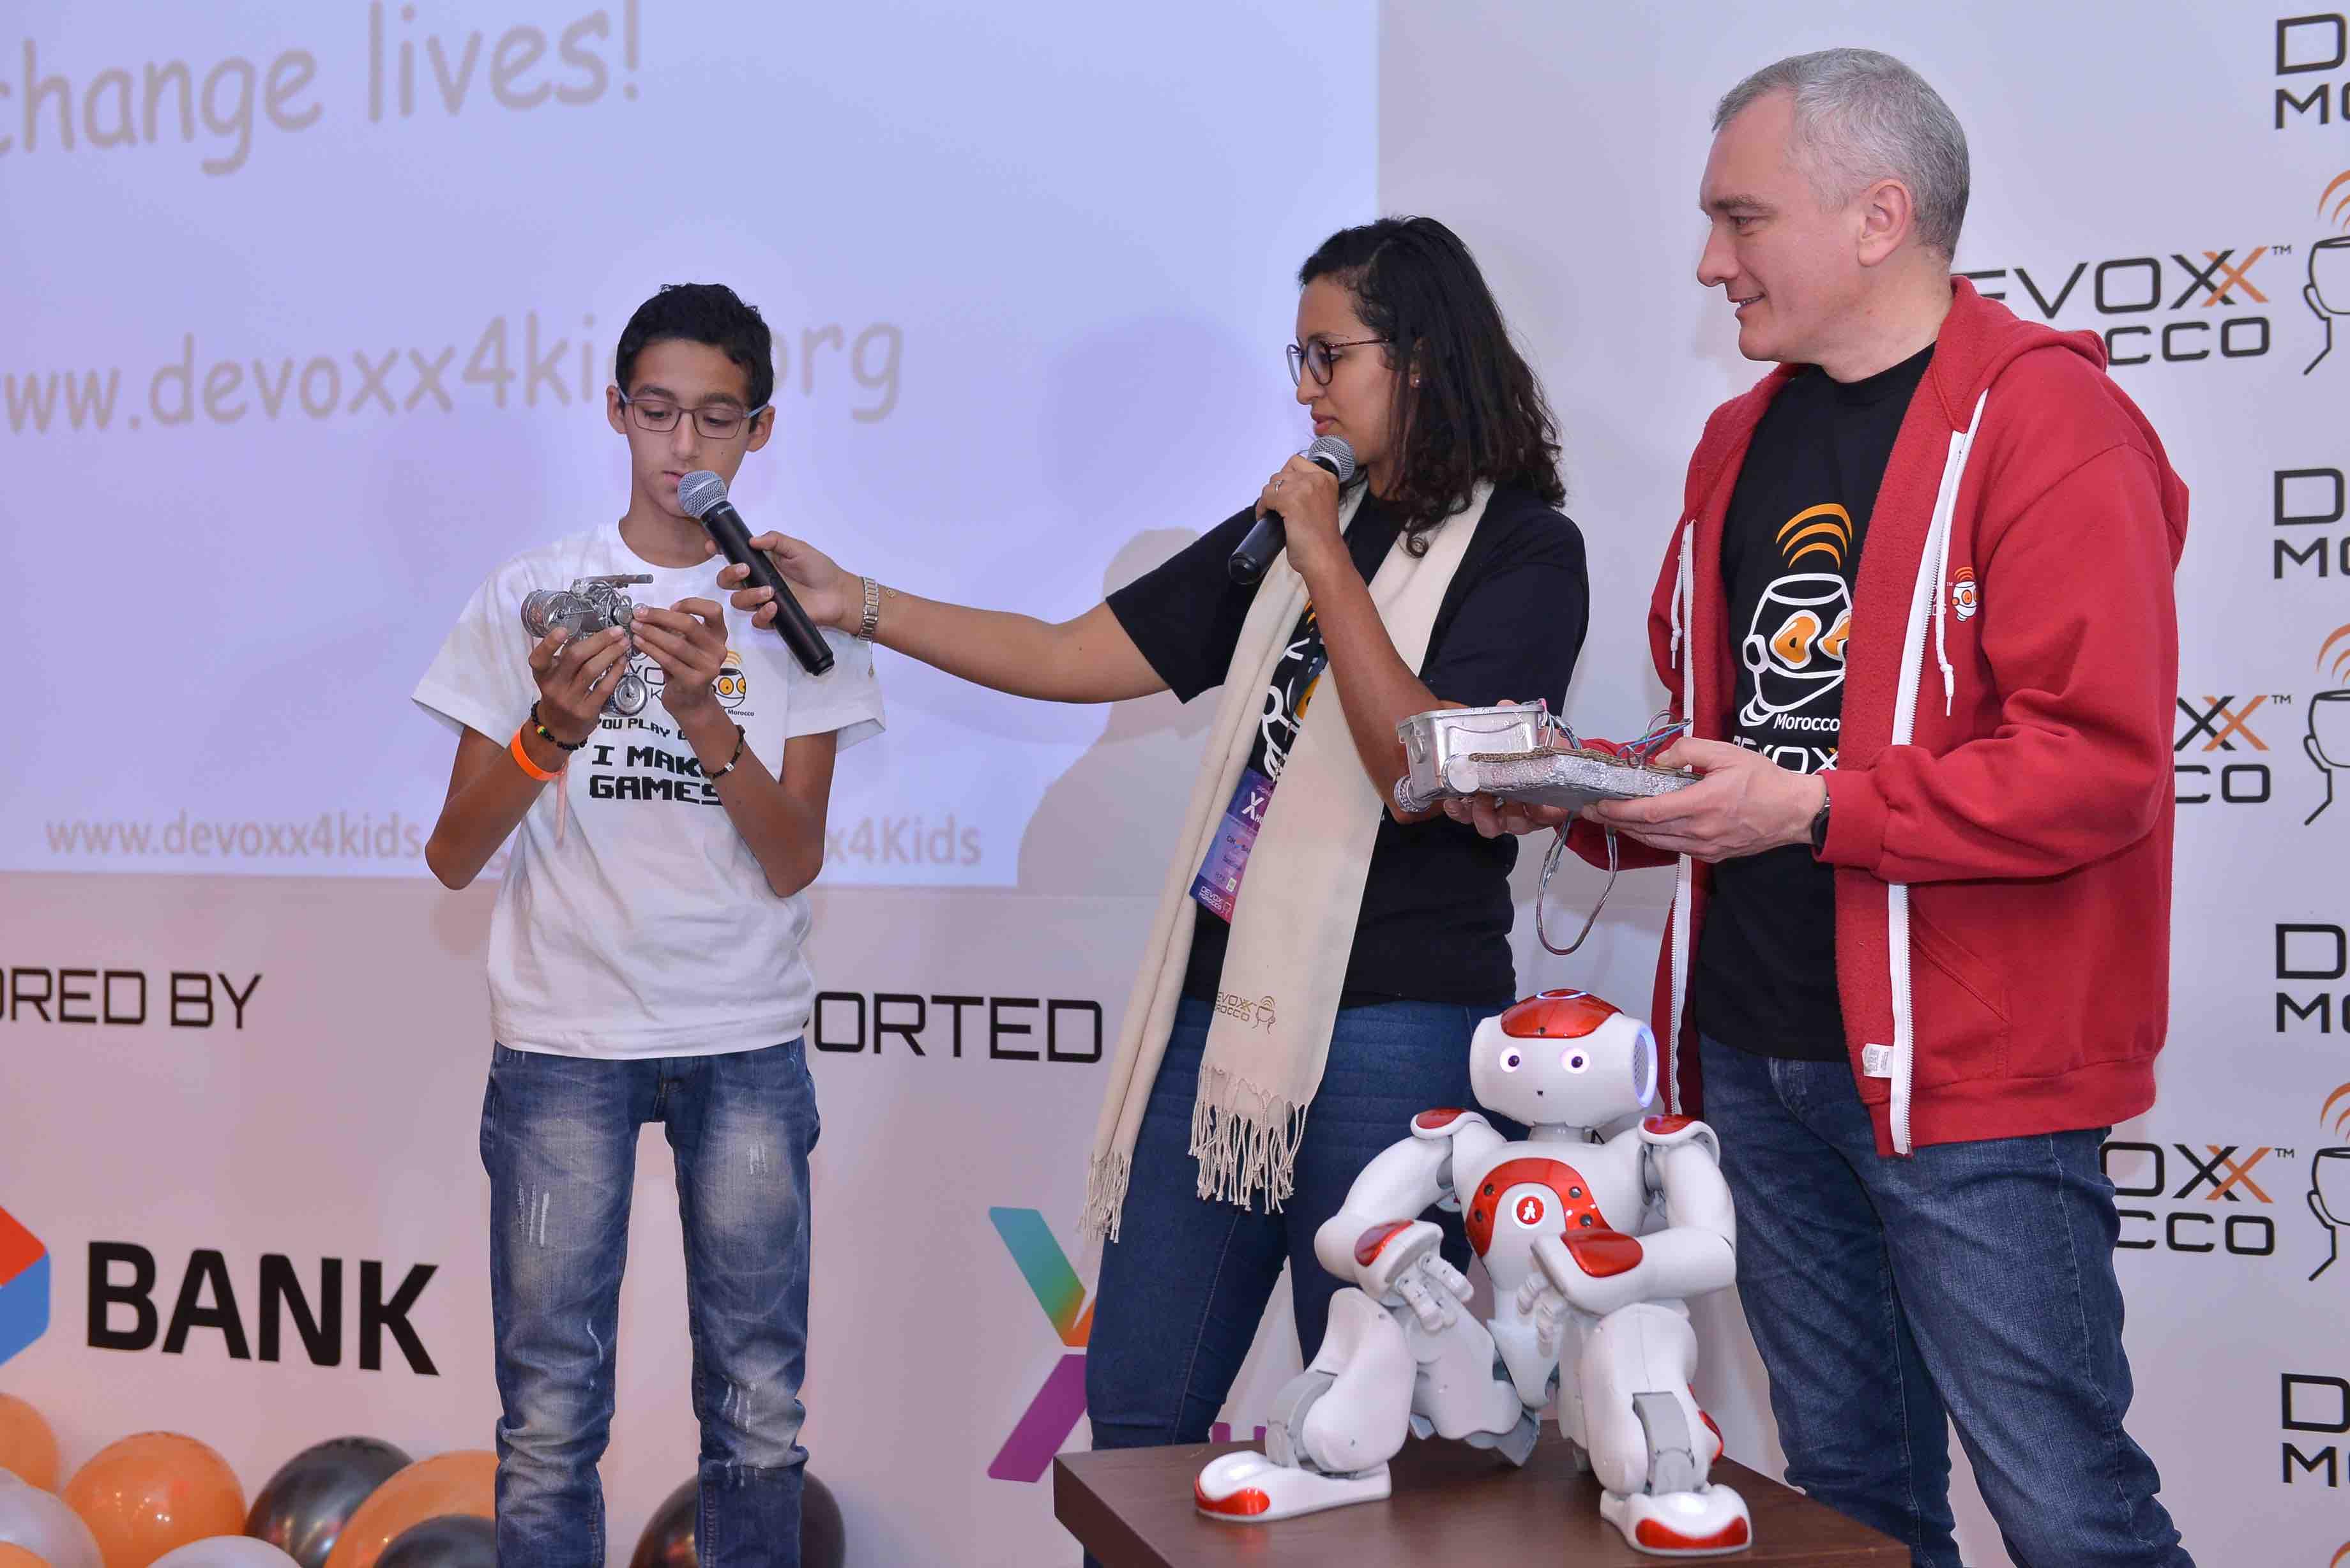 Clôture de la caravane 2017 Devoxx4KIDS Morocco